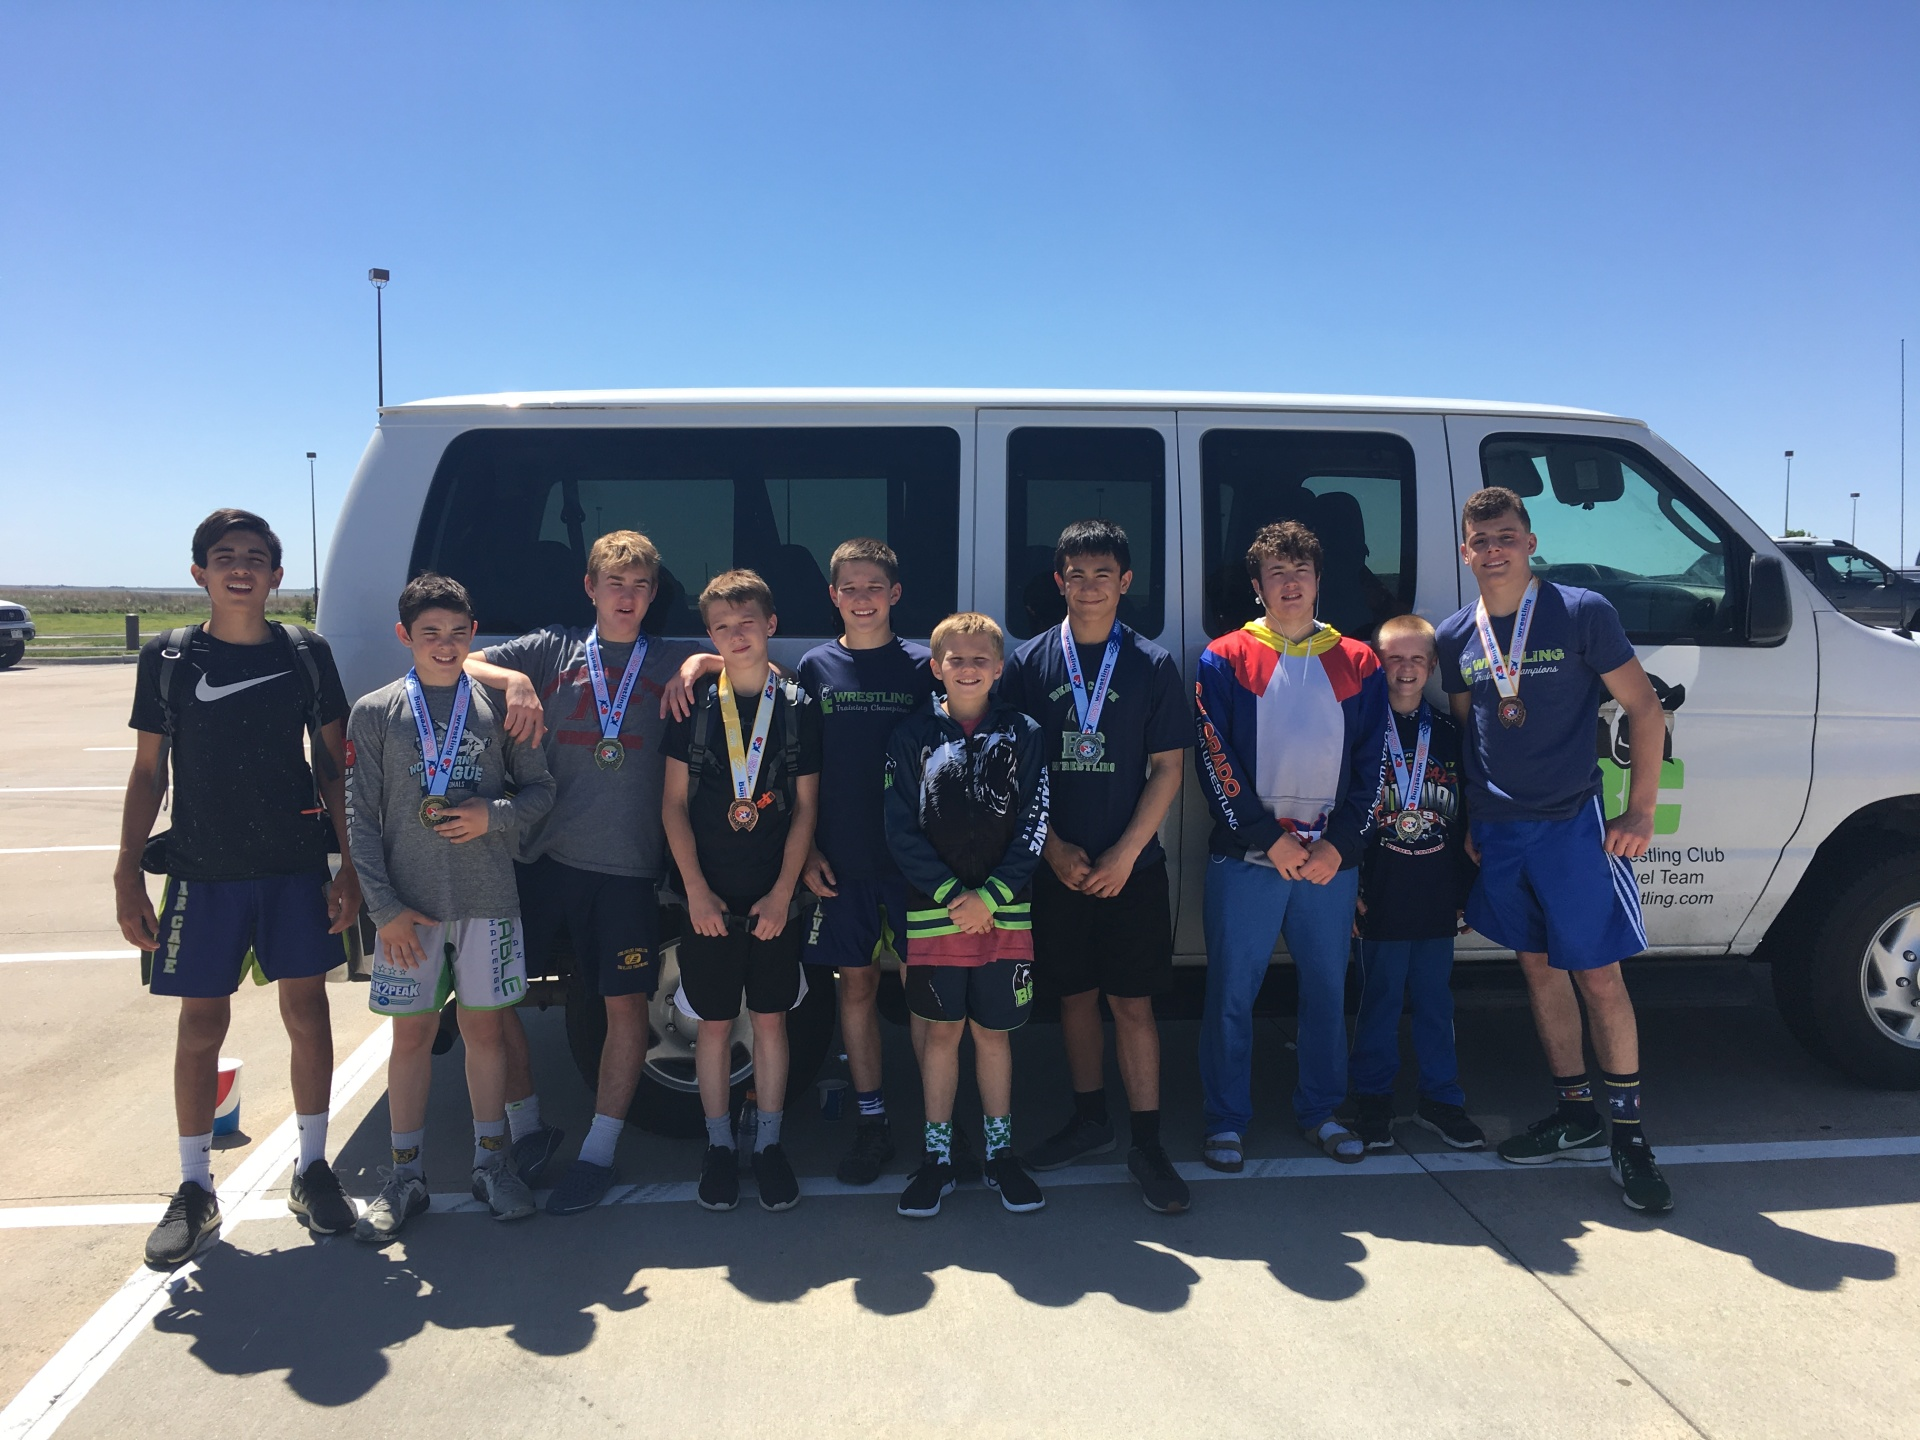 Bear Cave Van Travels To Dodge City, KS